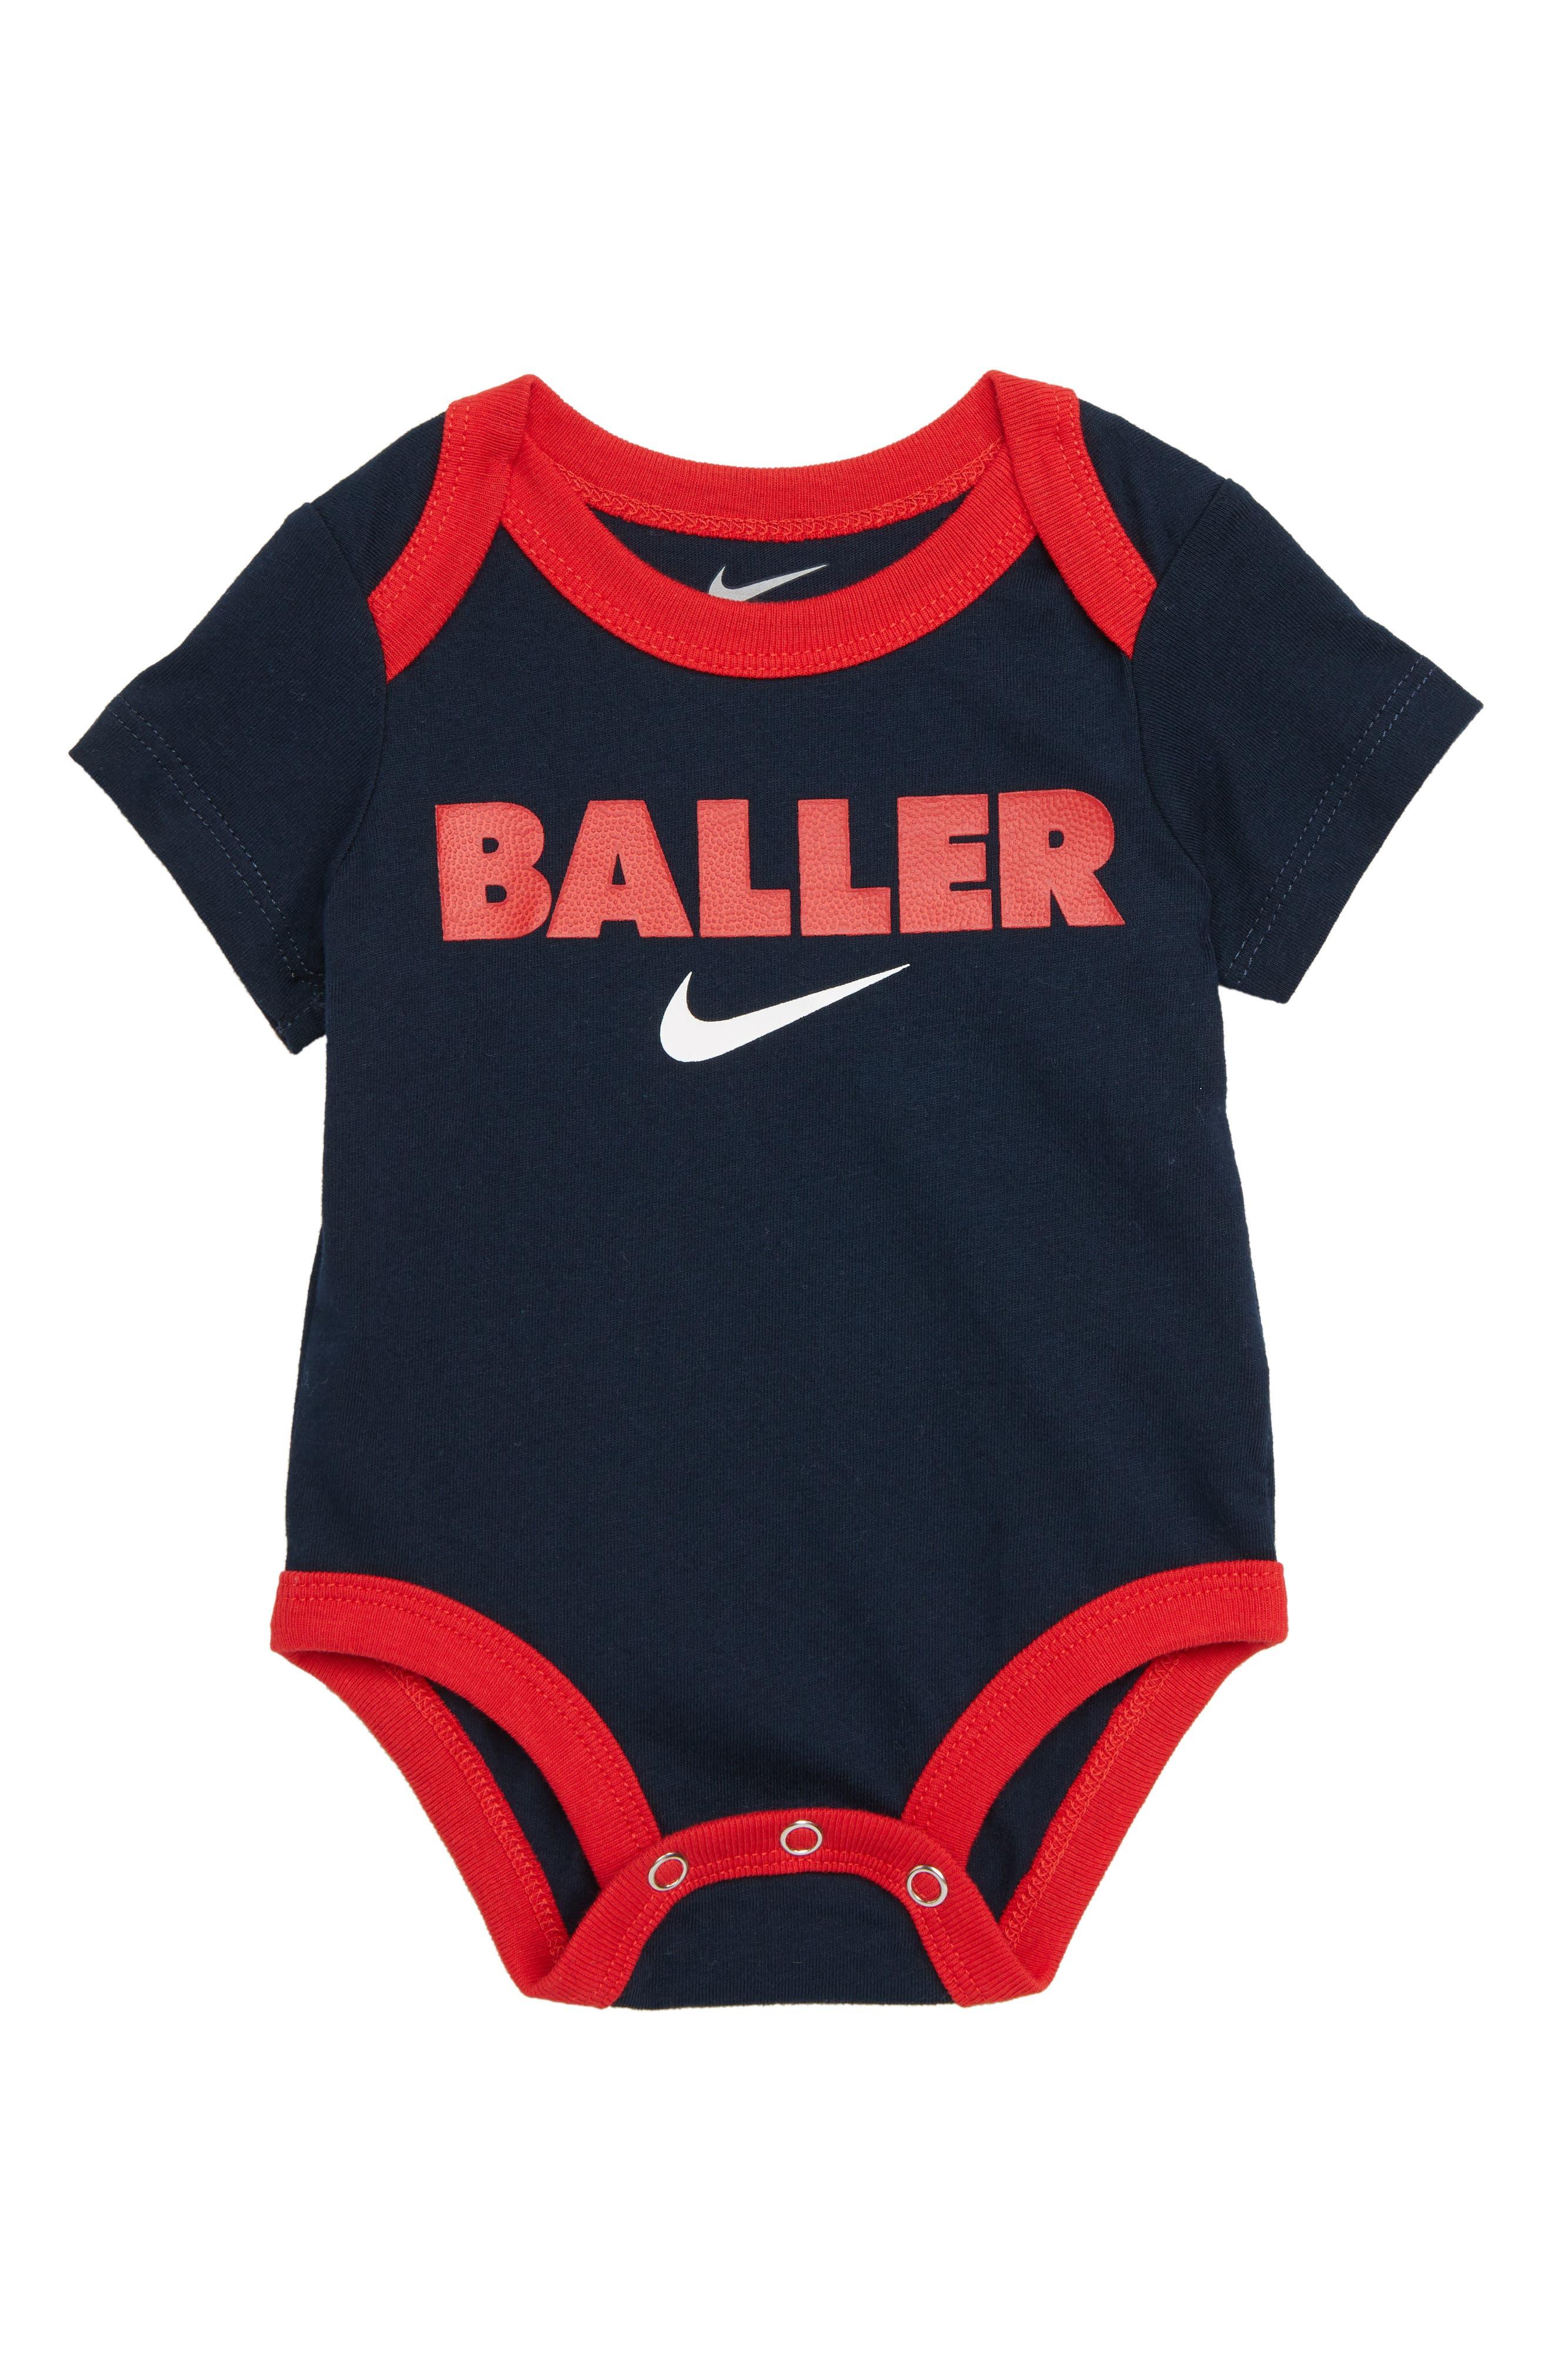 Baller Bodysuit,                             Main thumbnail 1, color,                             425